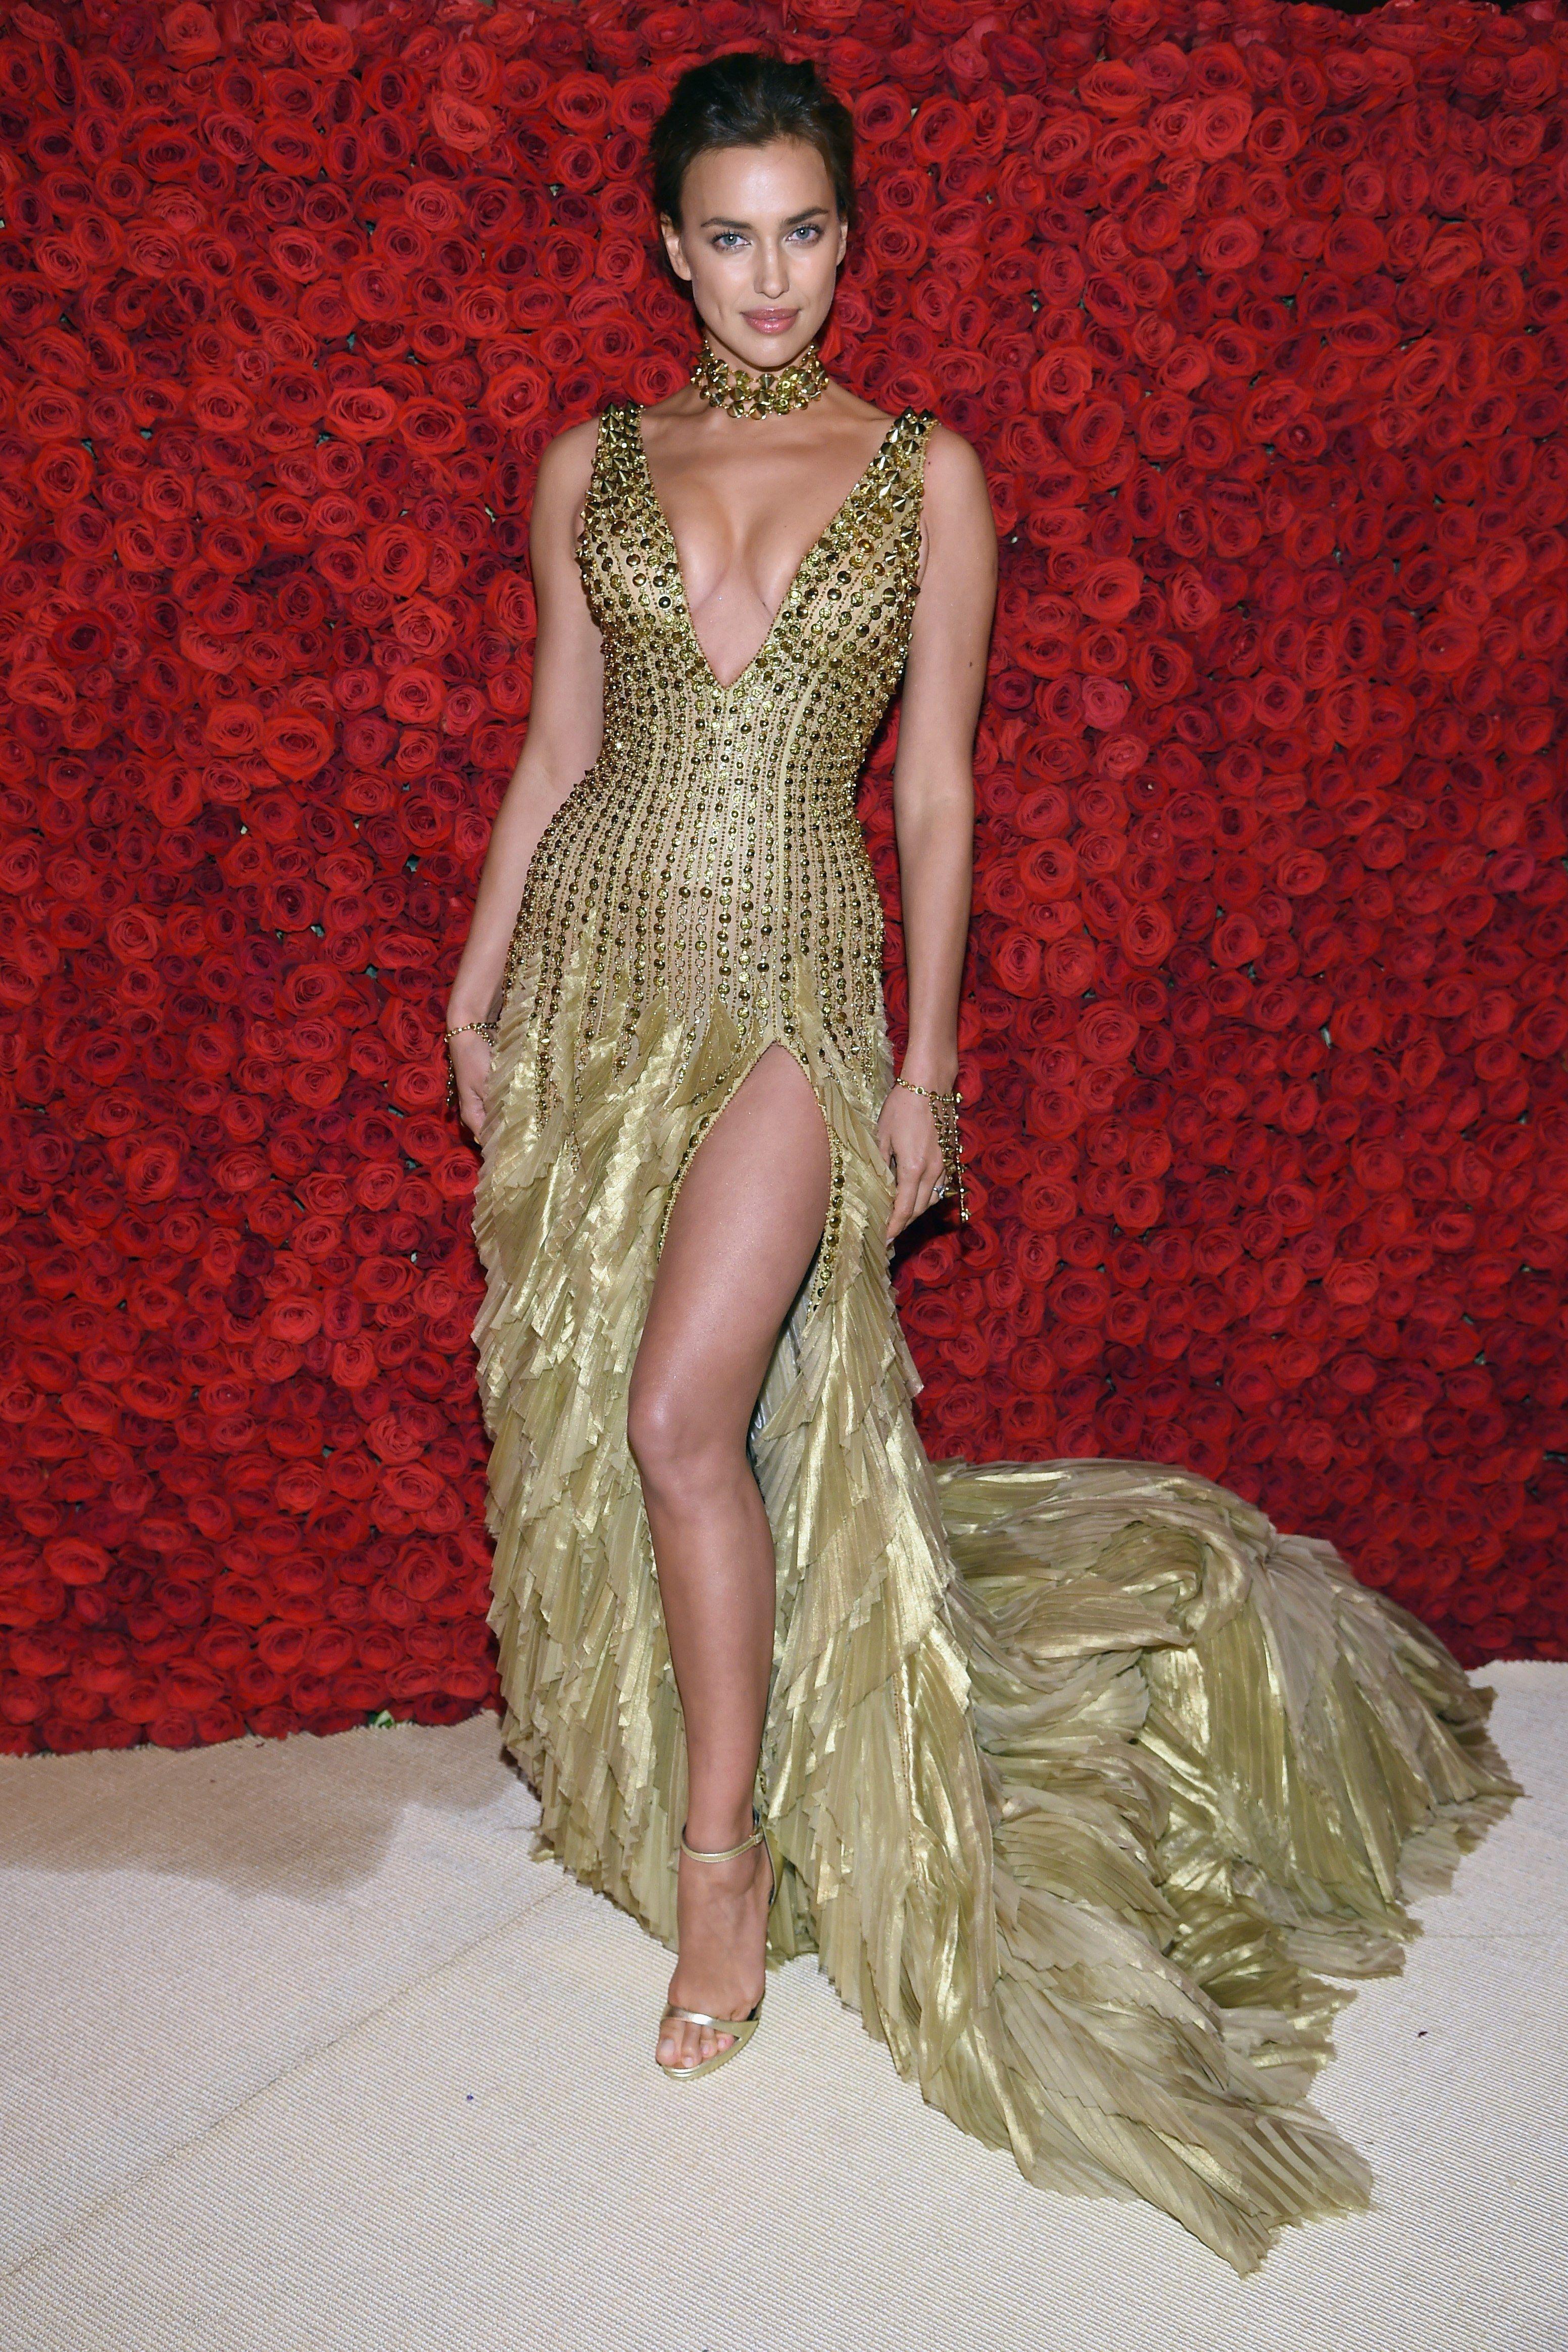 Met Gala 2018 Red Carpet All The Celebrity Dresses And Fashion Irina Shayk Style Met Gala Irina Shayk Dress